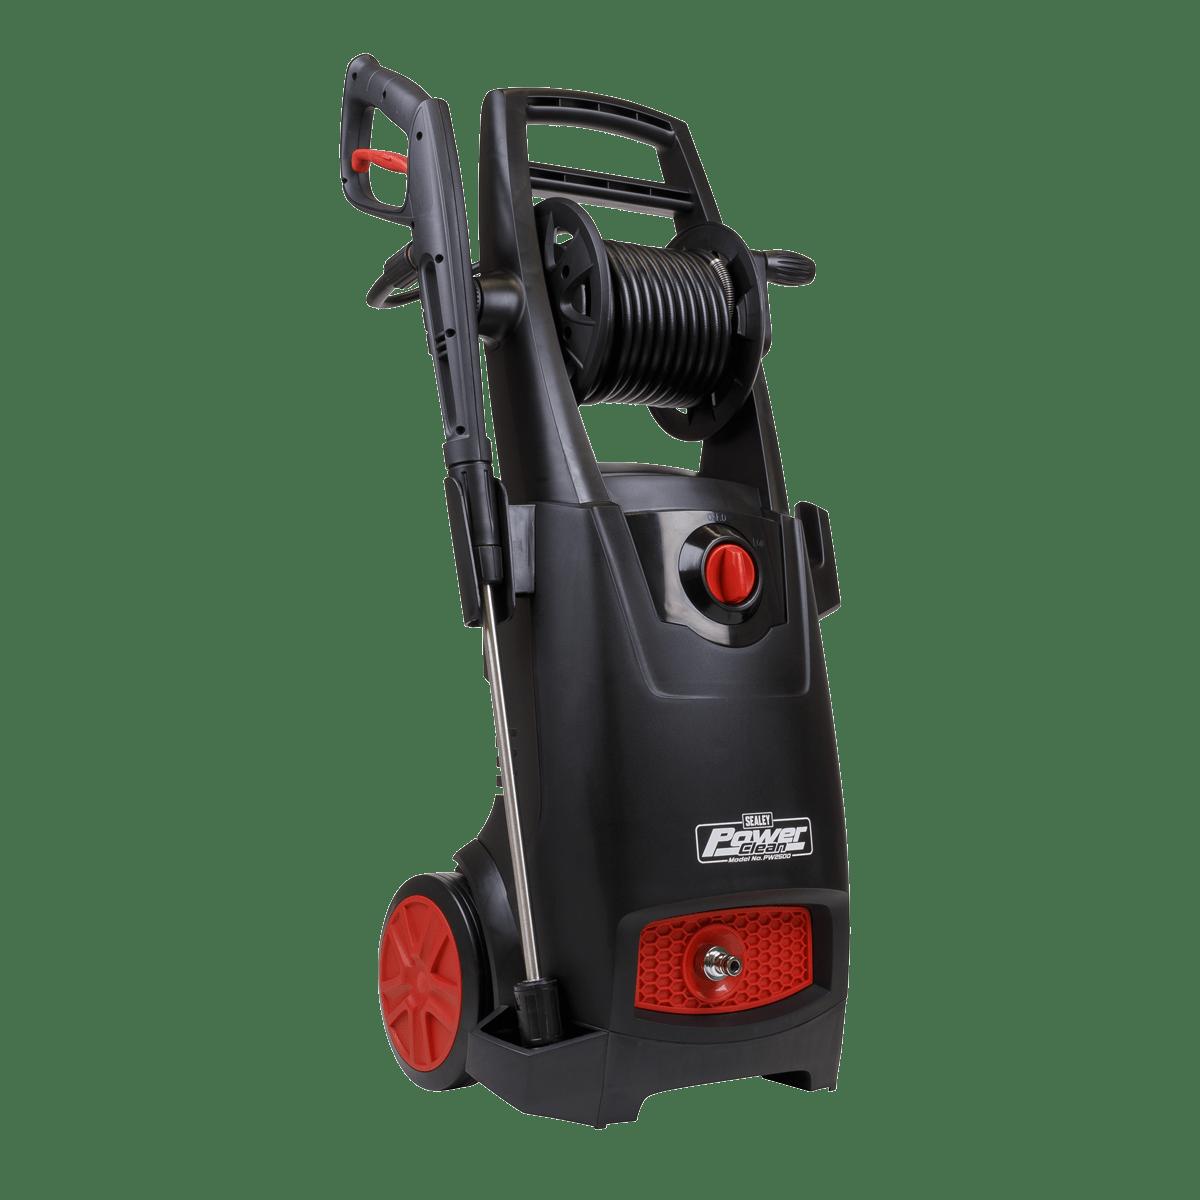 Sealey Pressure Washer 170bar with TSS & Rotablast® Nozzle 230V PW2500